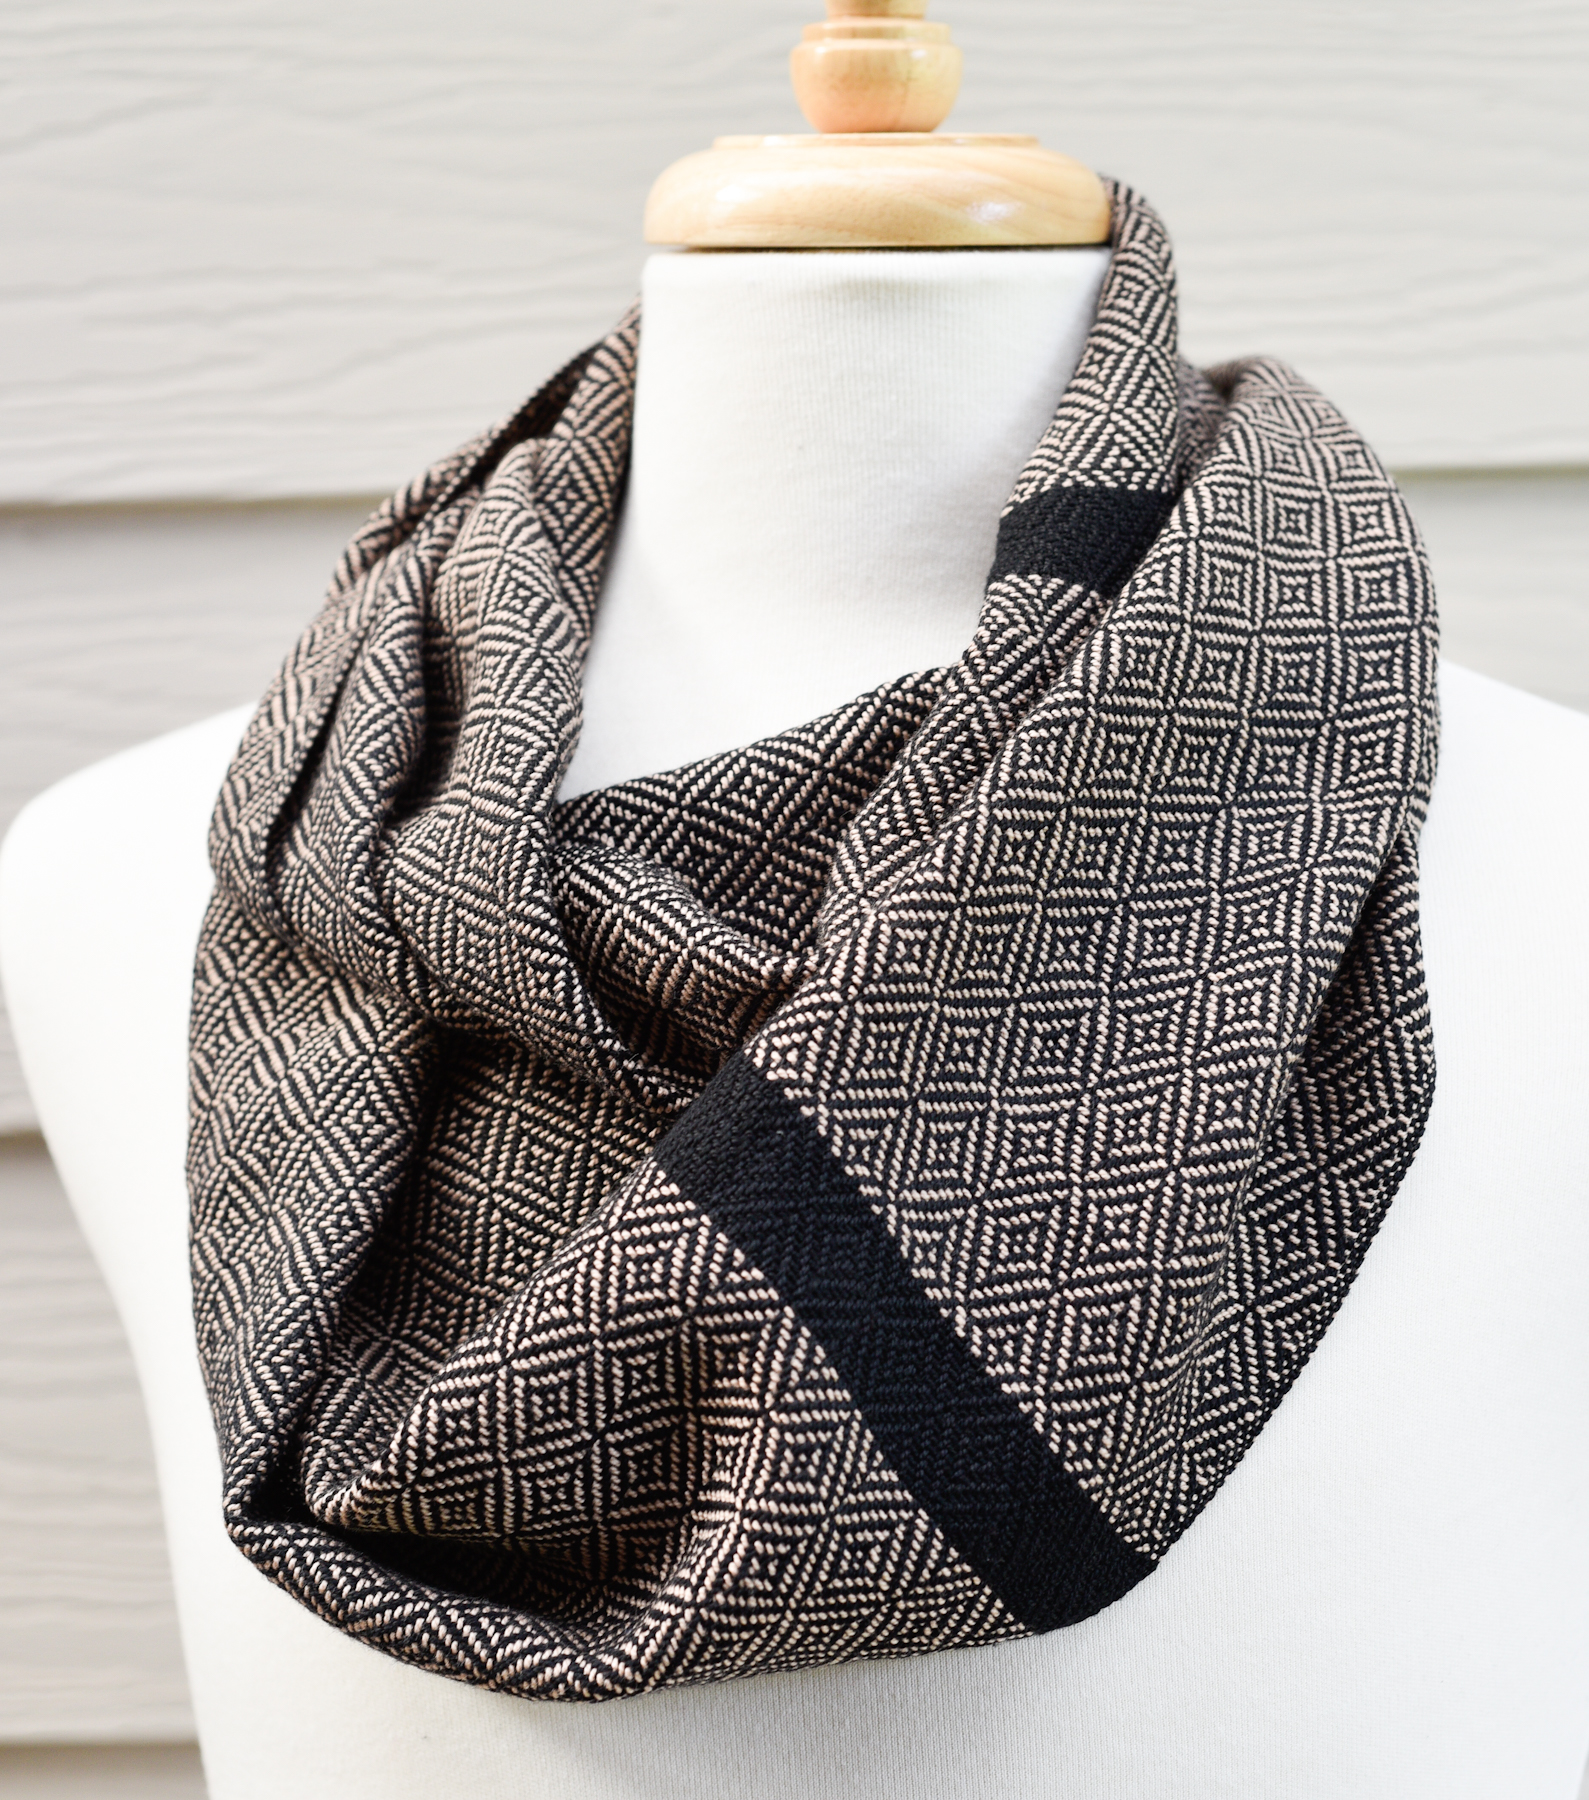 HandwovenCottonScarf_GeometricOatmeal.jpg